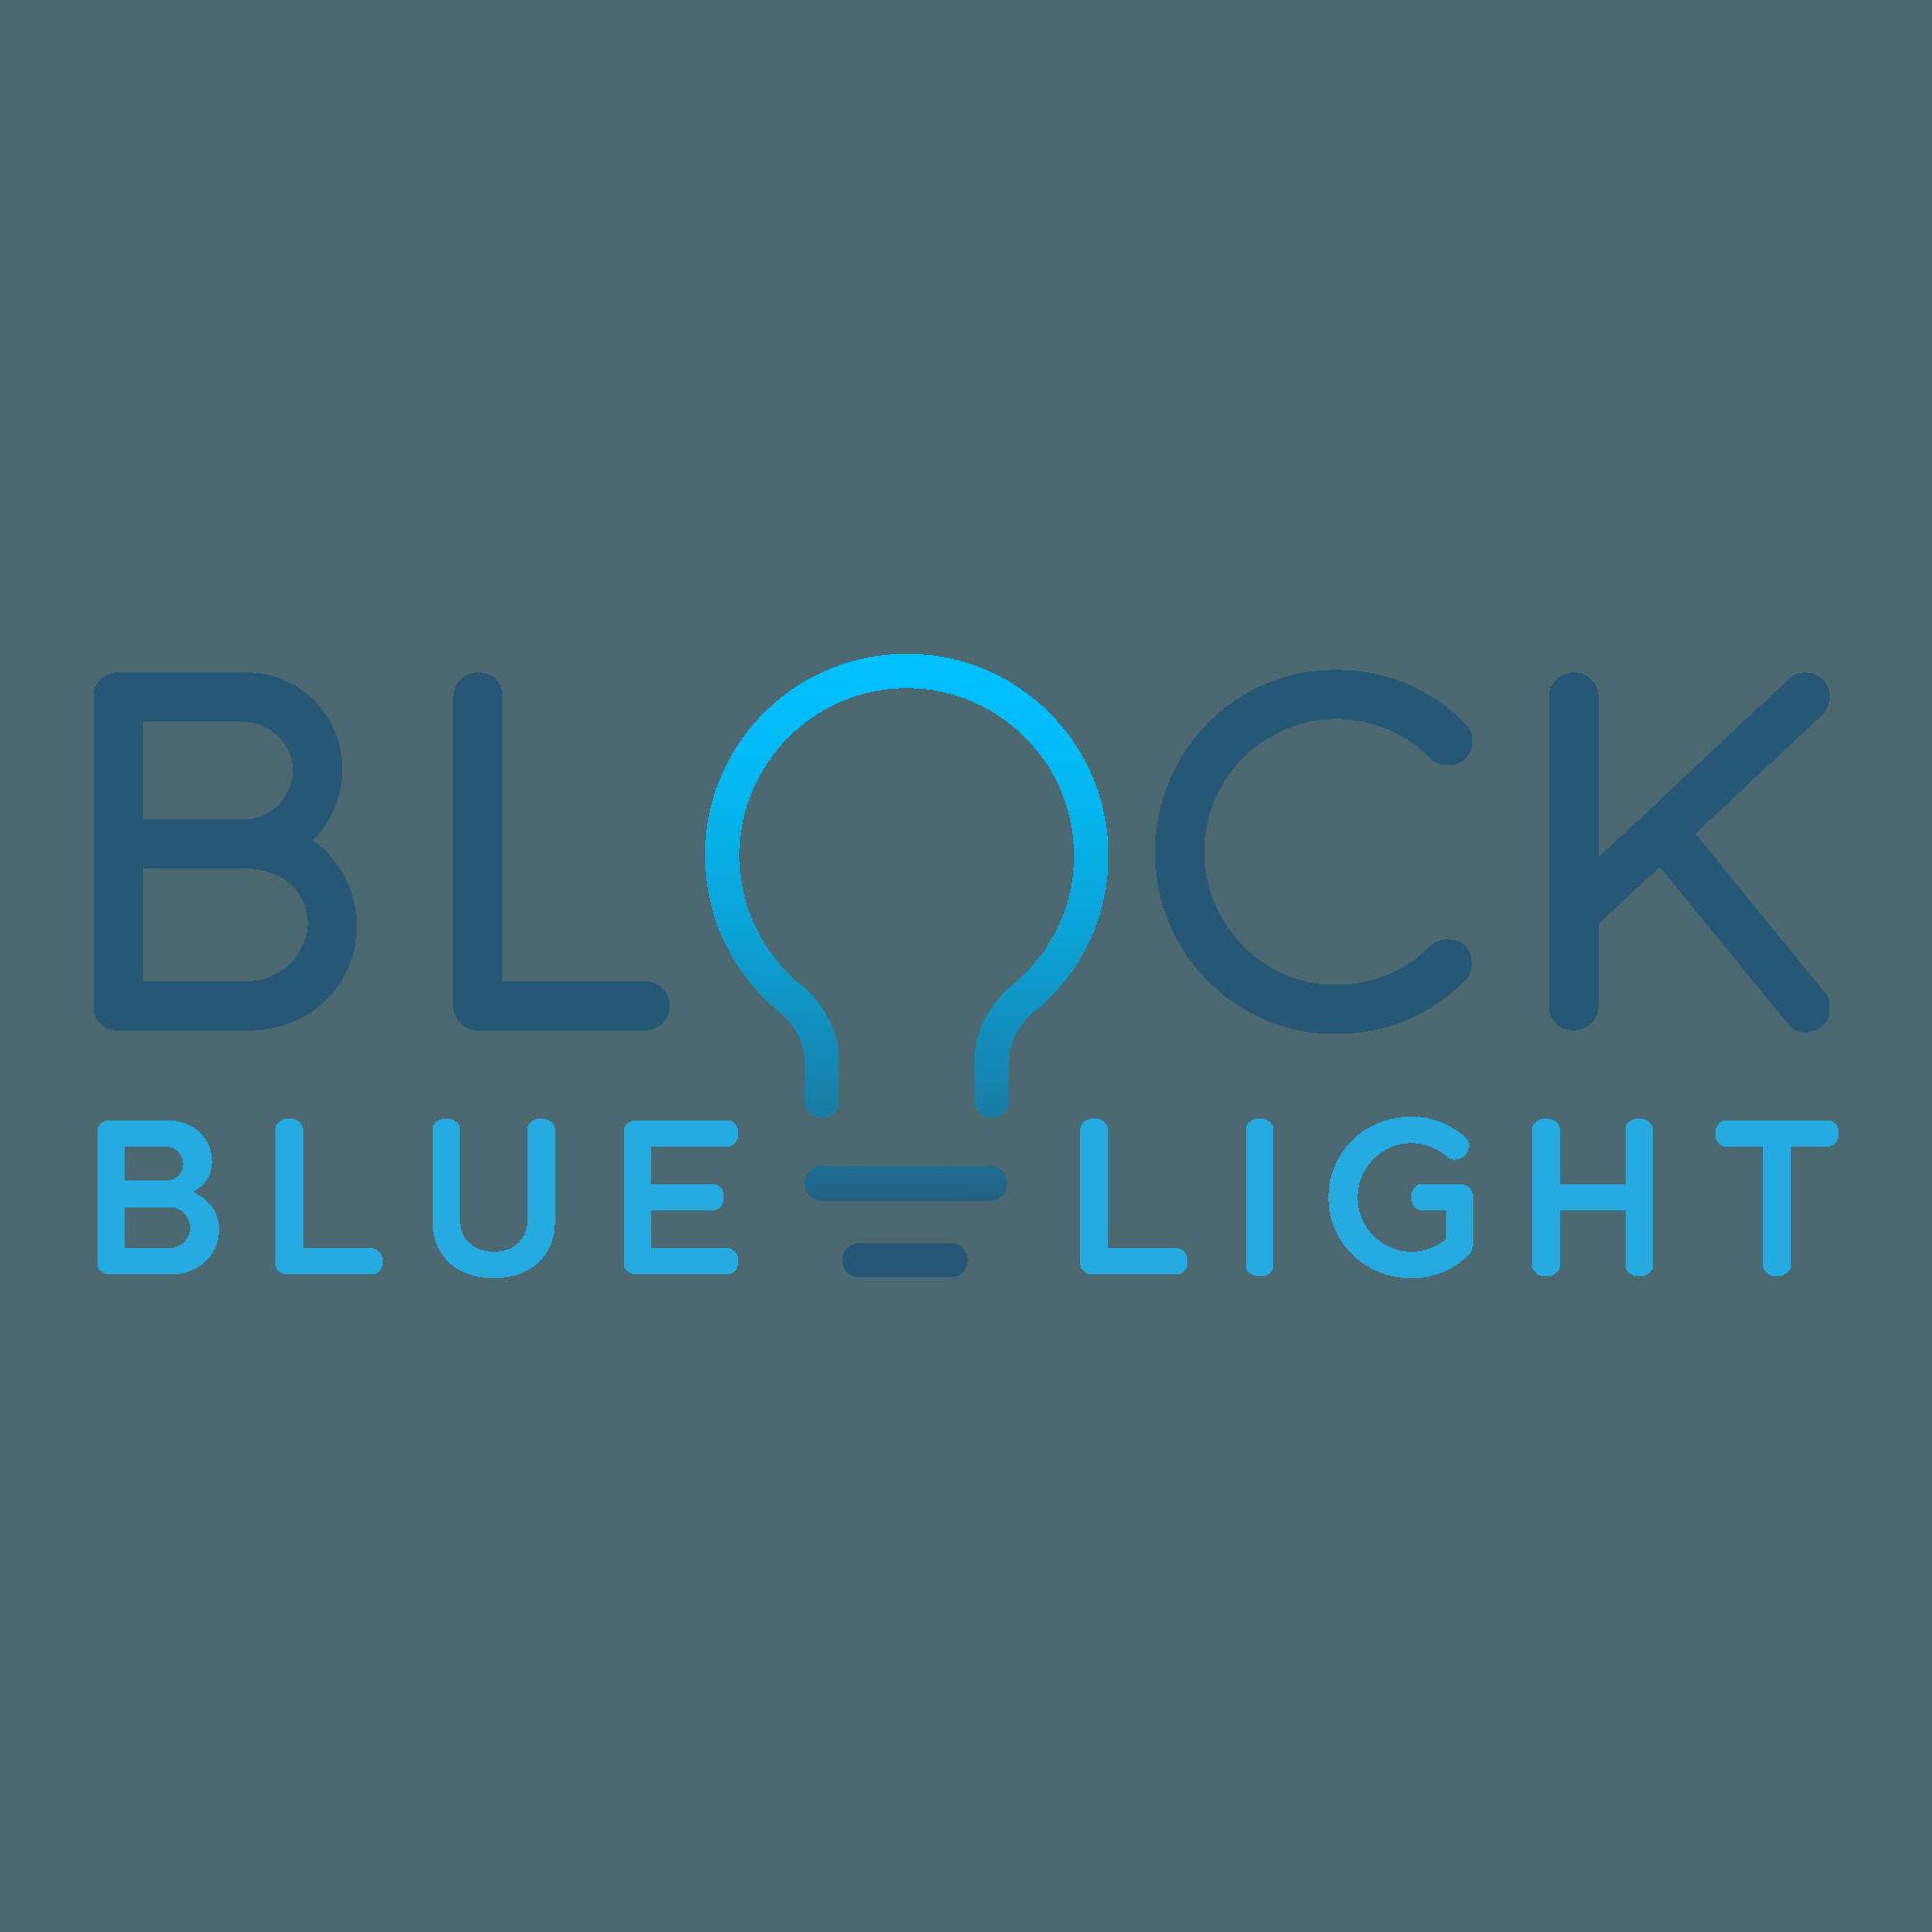 Eyecare Giant BlockBlueLight Discusses Hazards of Blue Light Emission